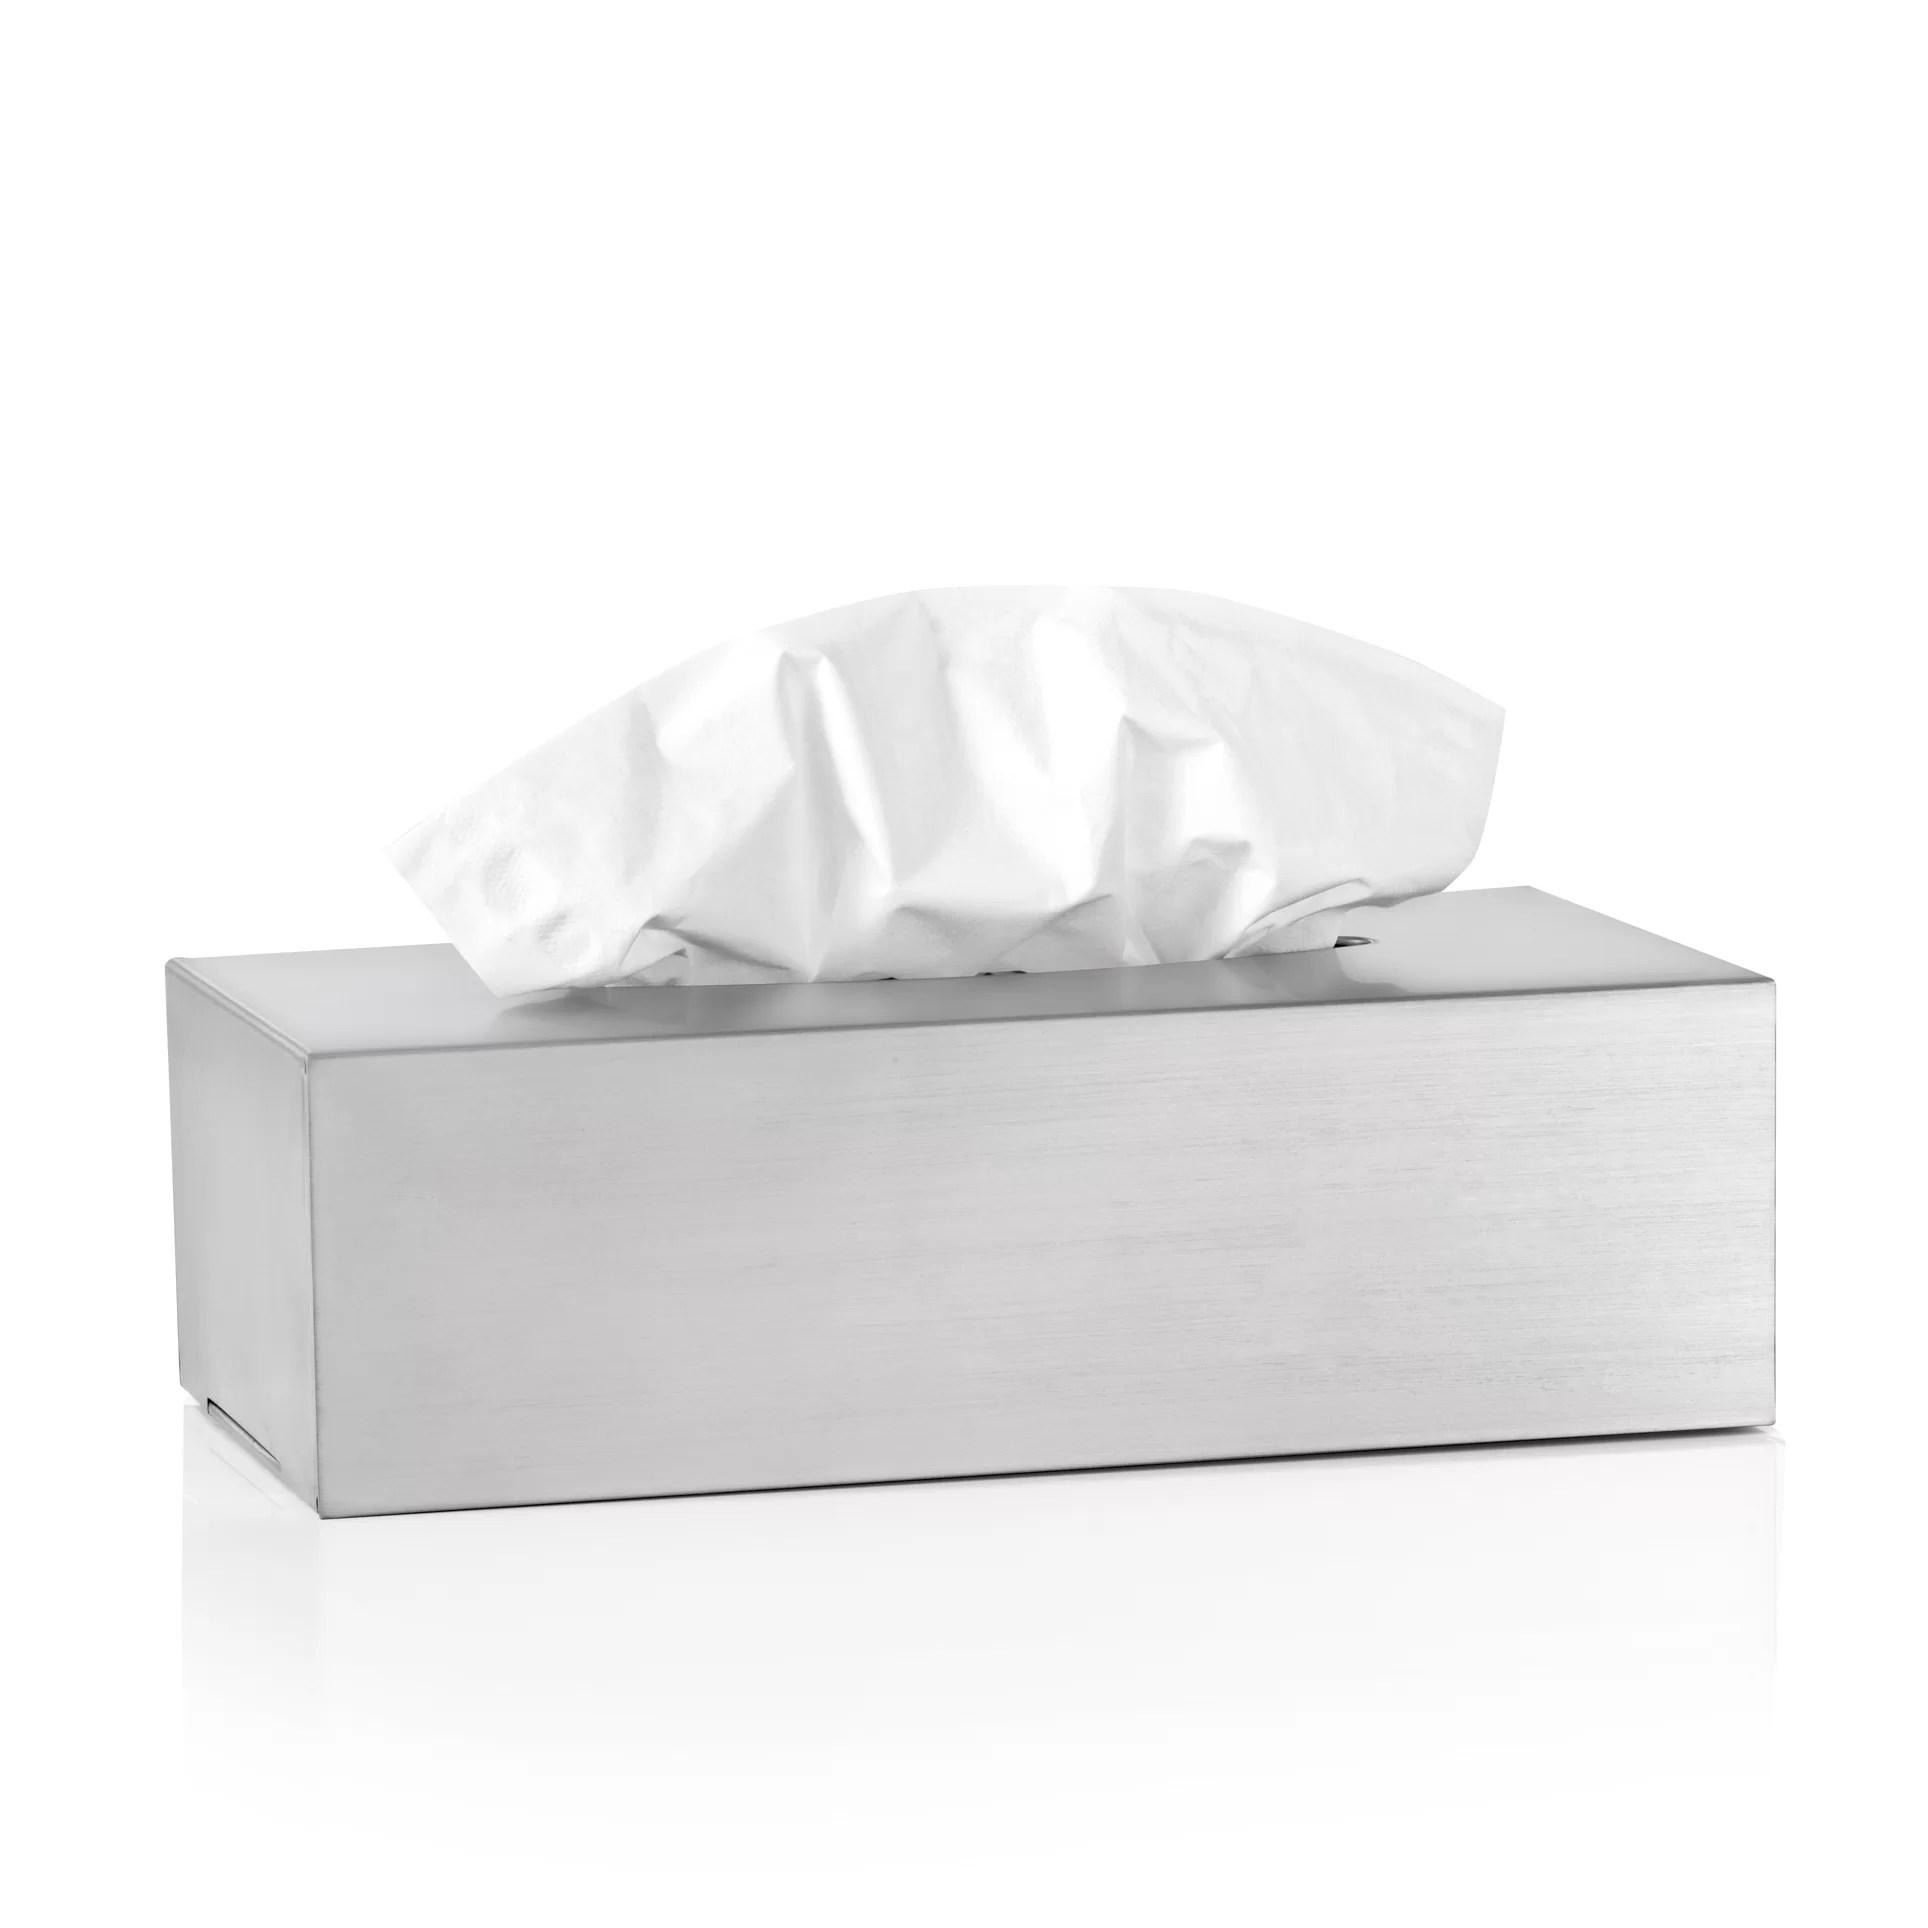 Fullsize Of Kleenex Box Covers